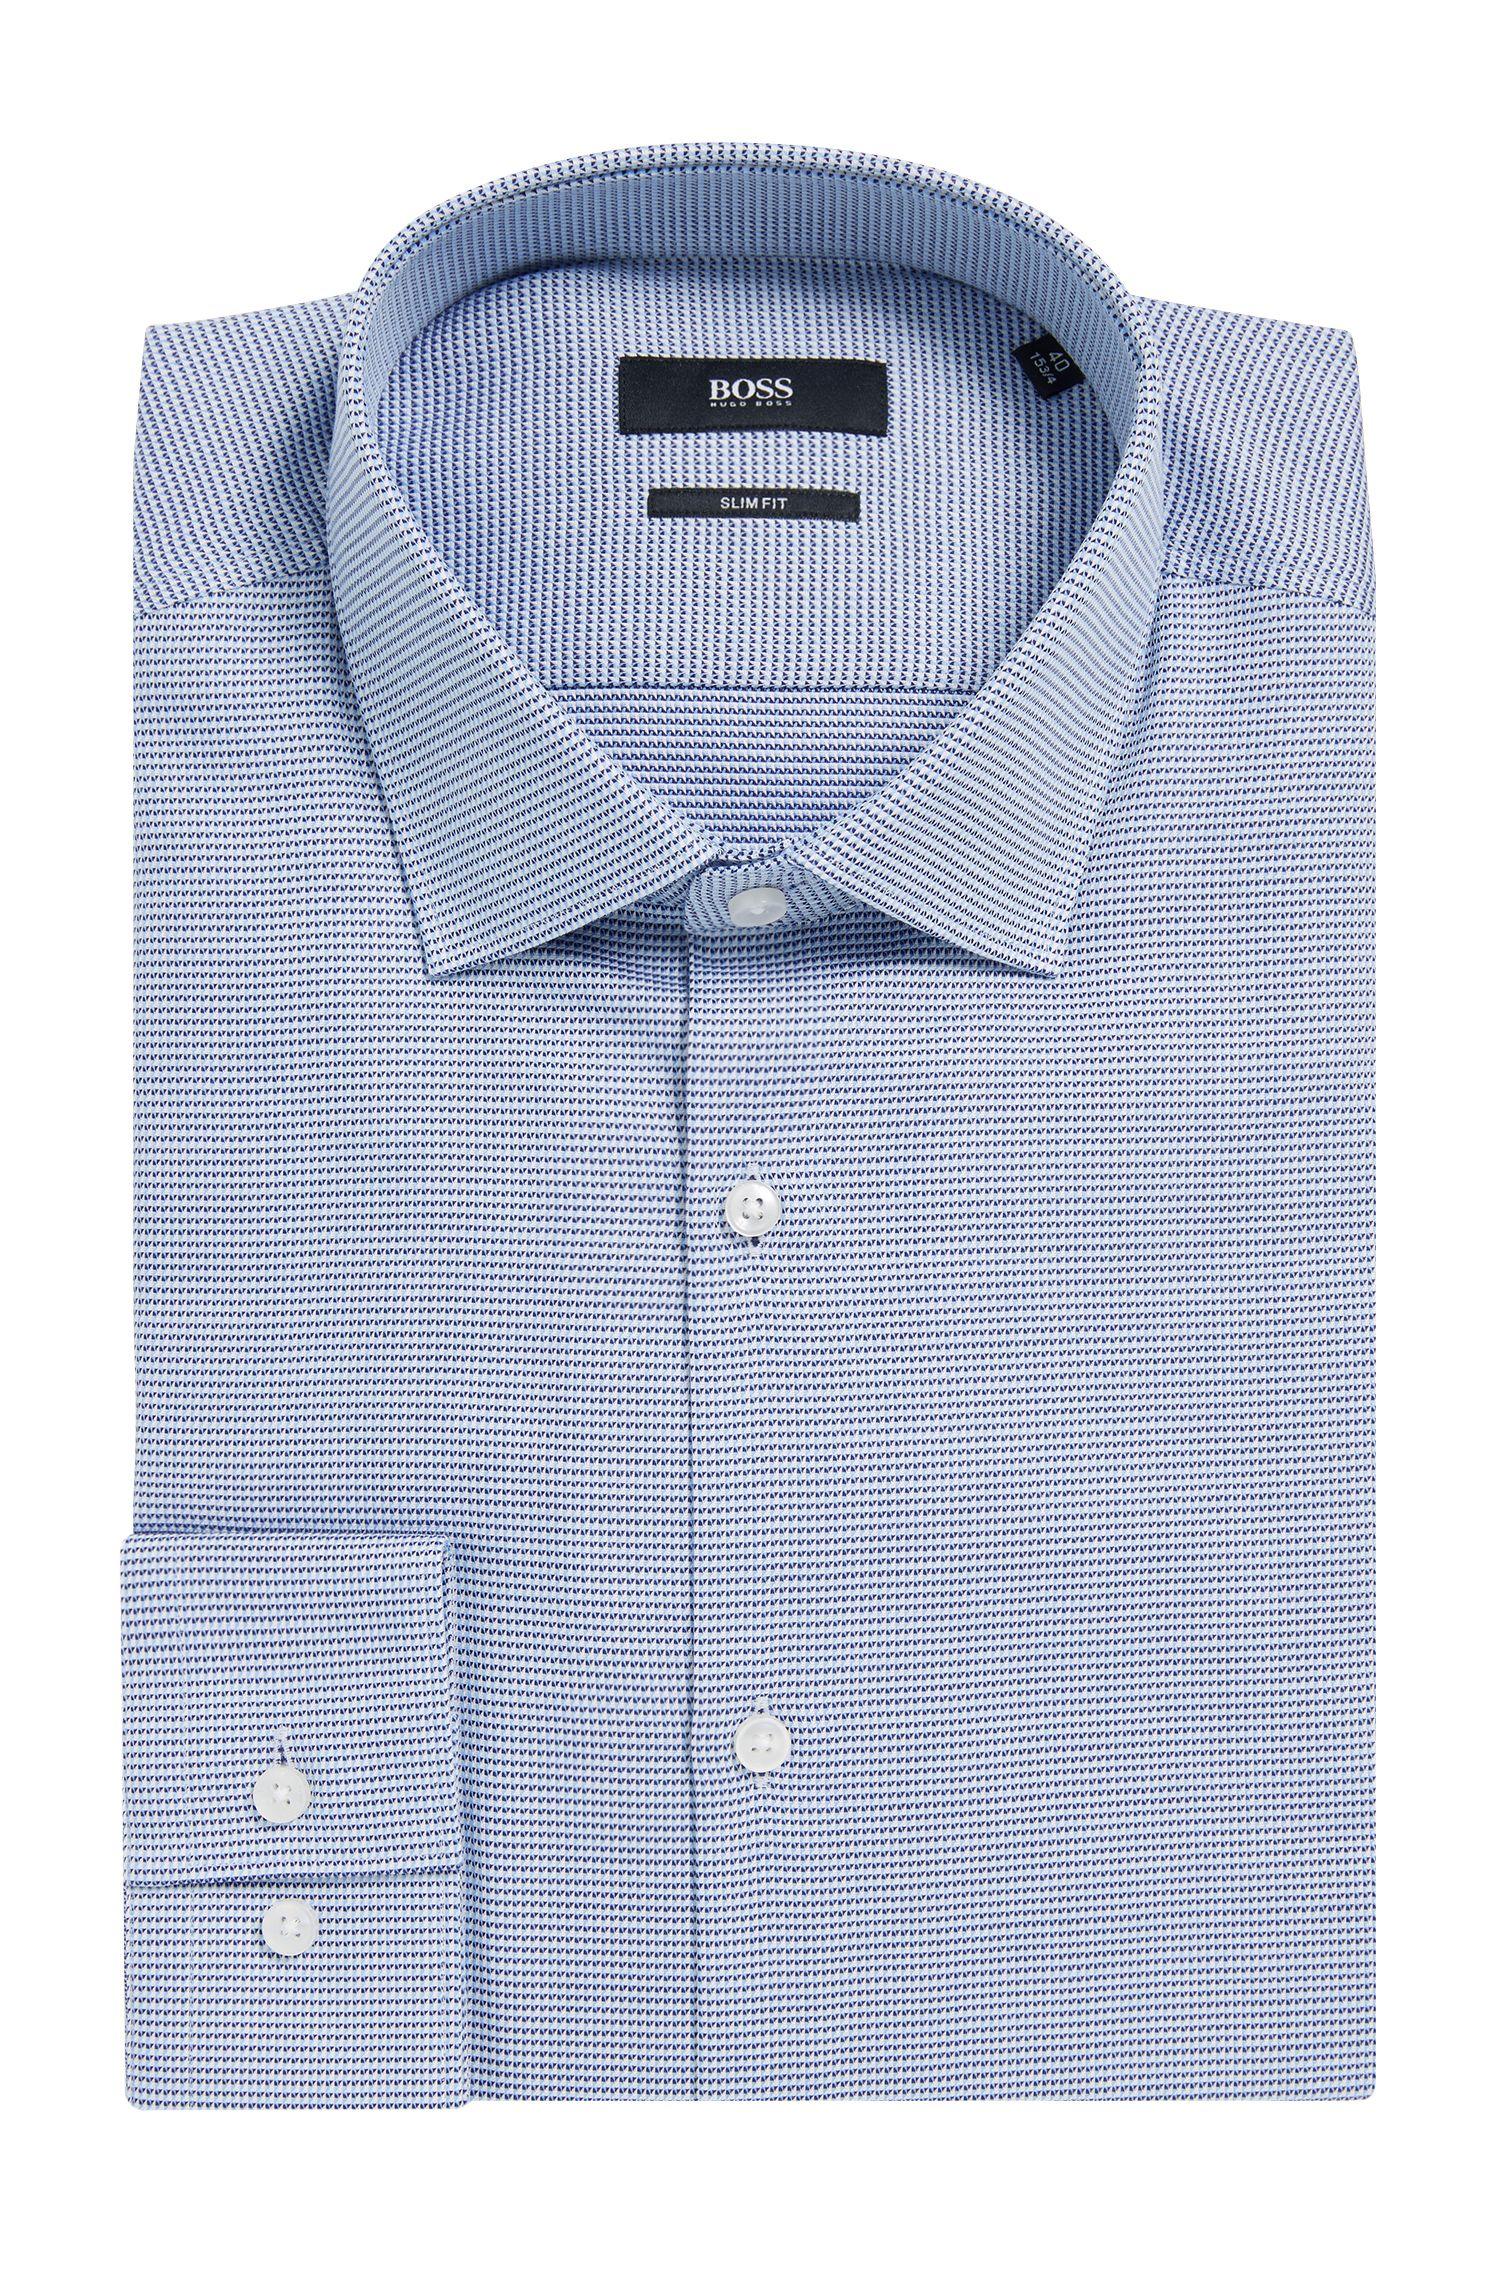 'Ismo' | Slim Fit, Pin Check Cotton Dress Shirt